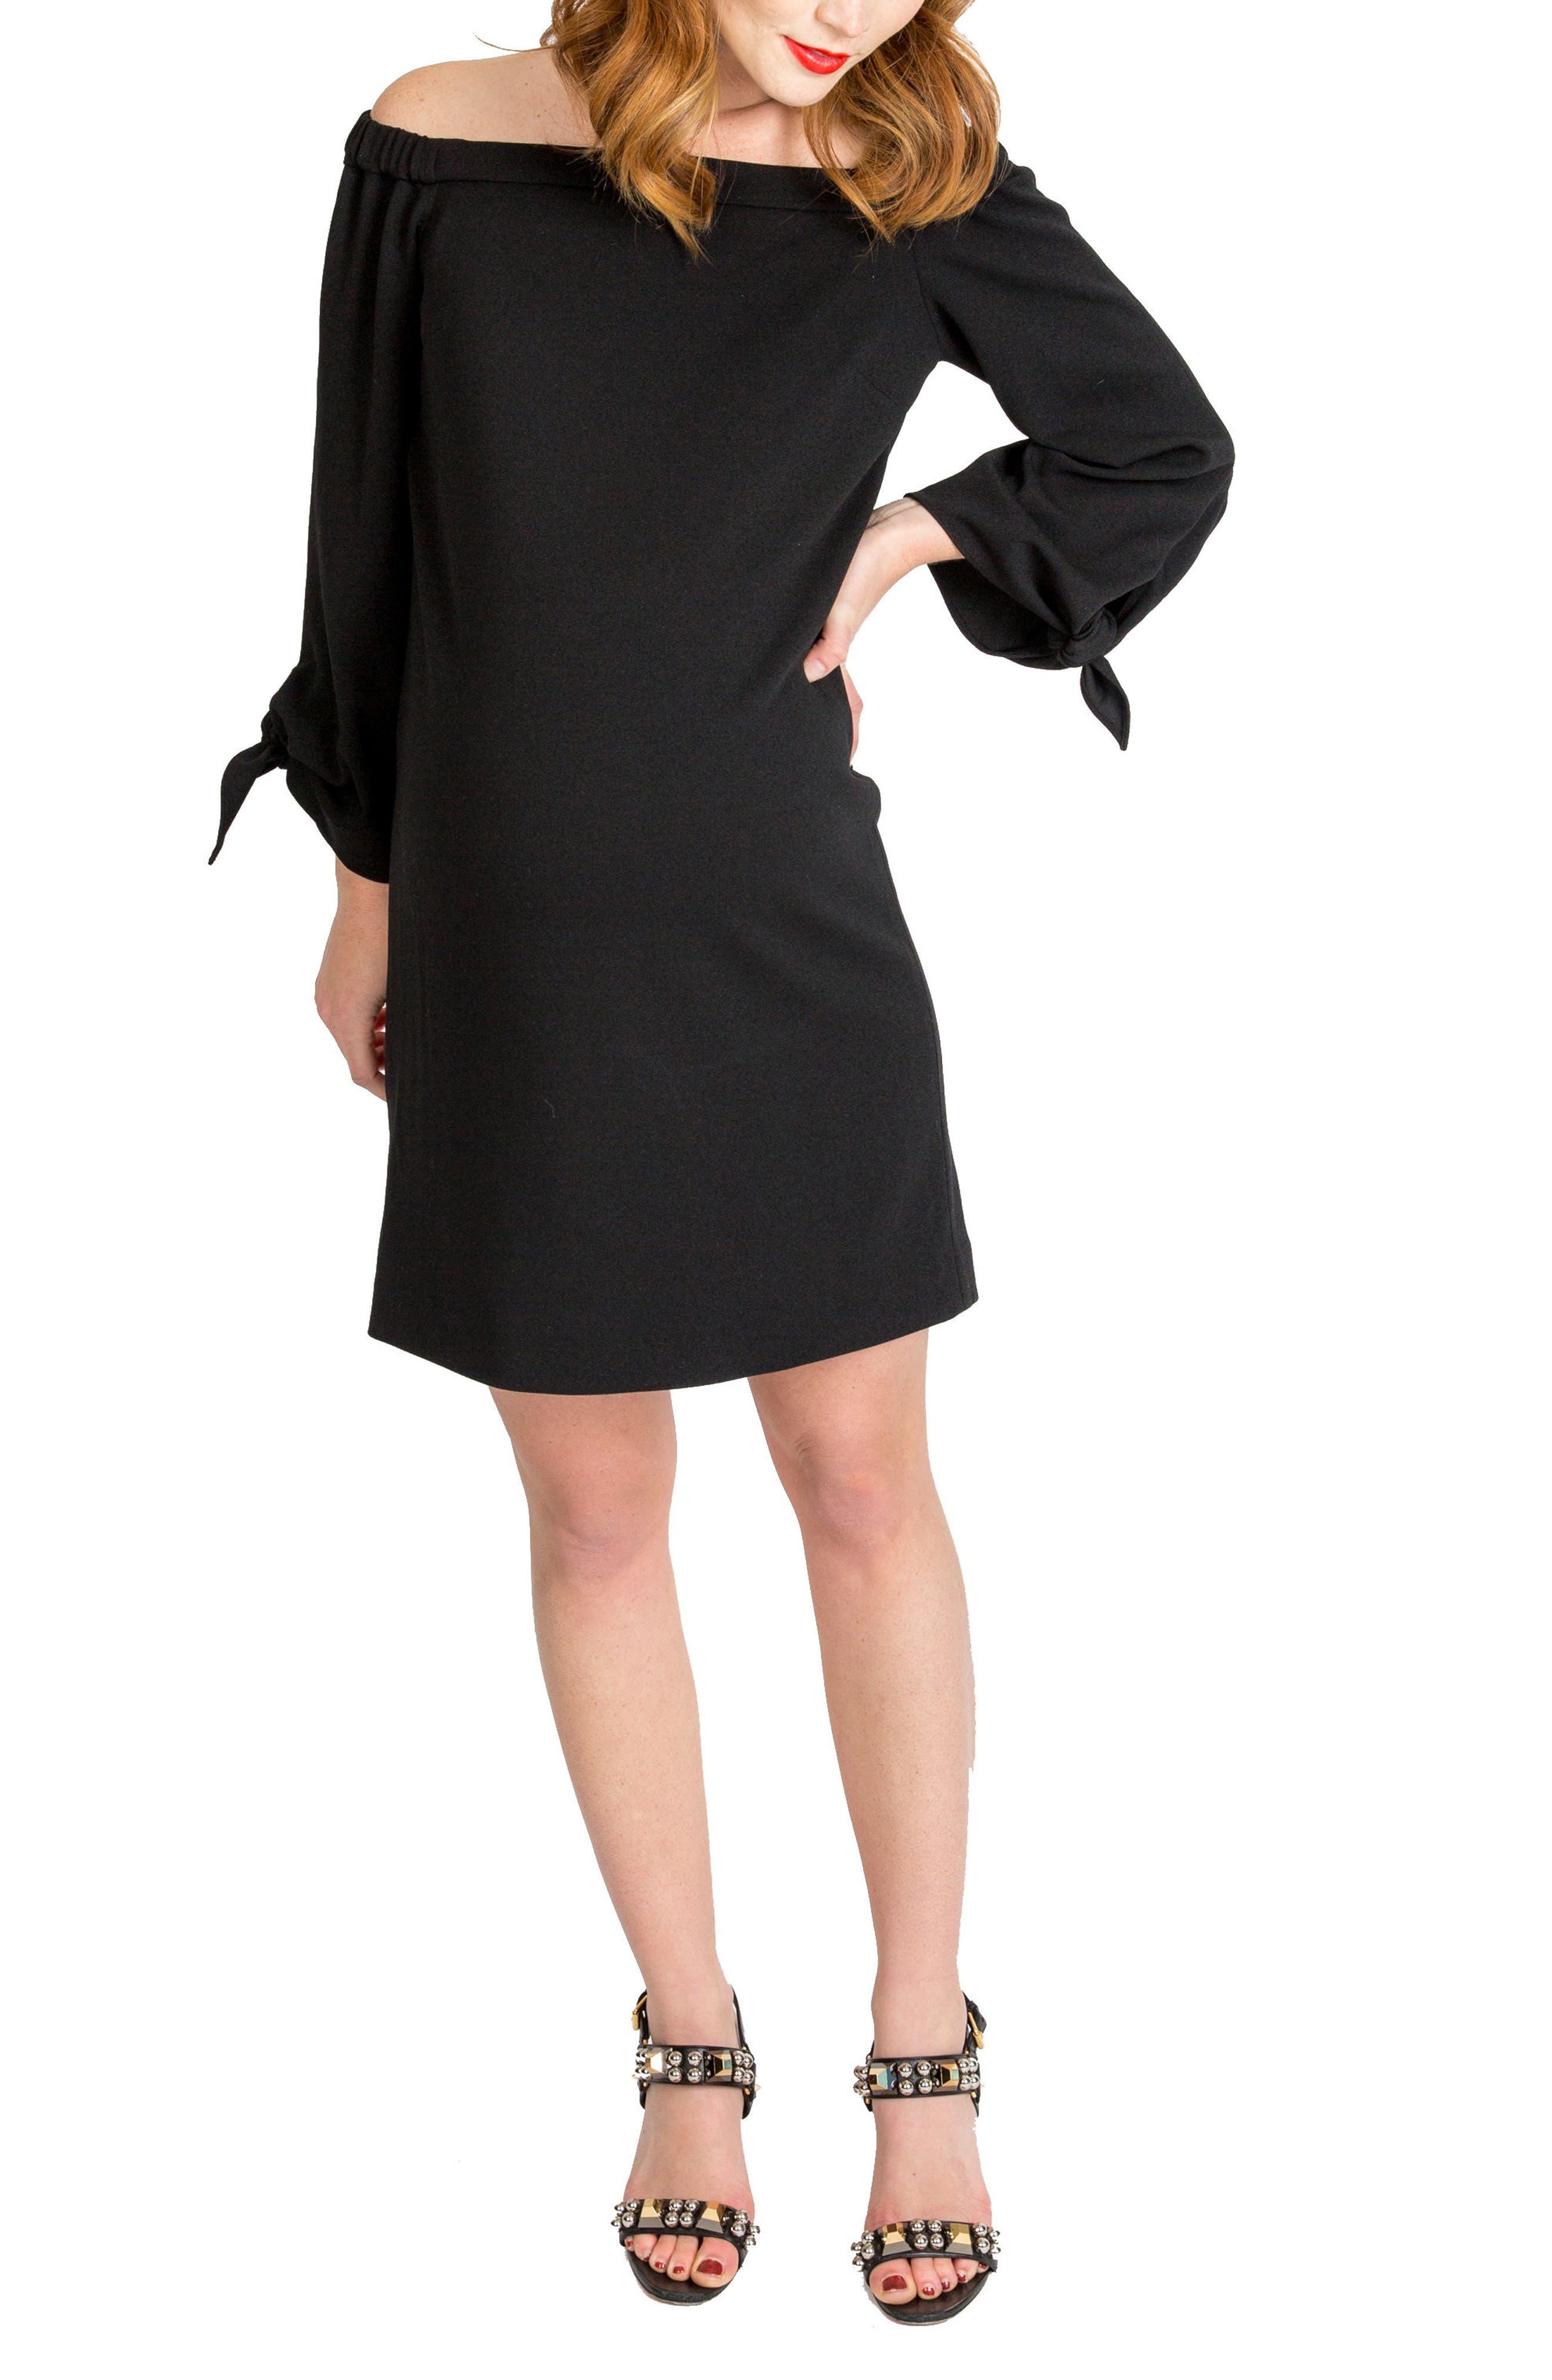 Nom Maternity Octavia Off The Shoulder Maternity Dress